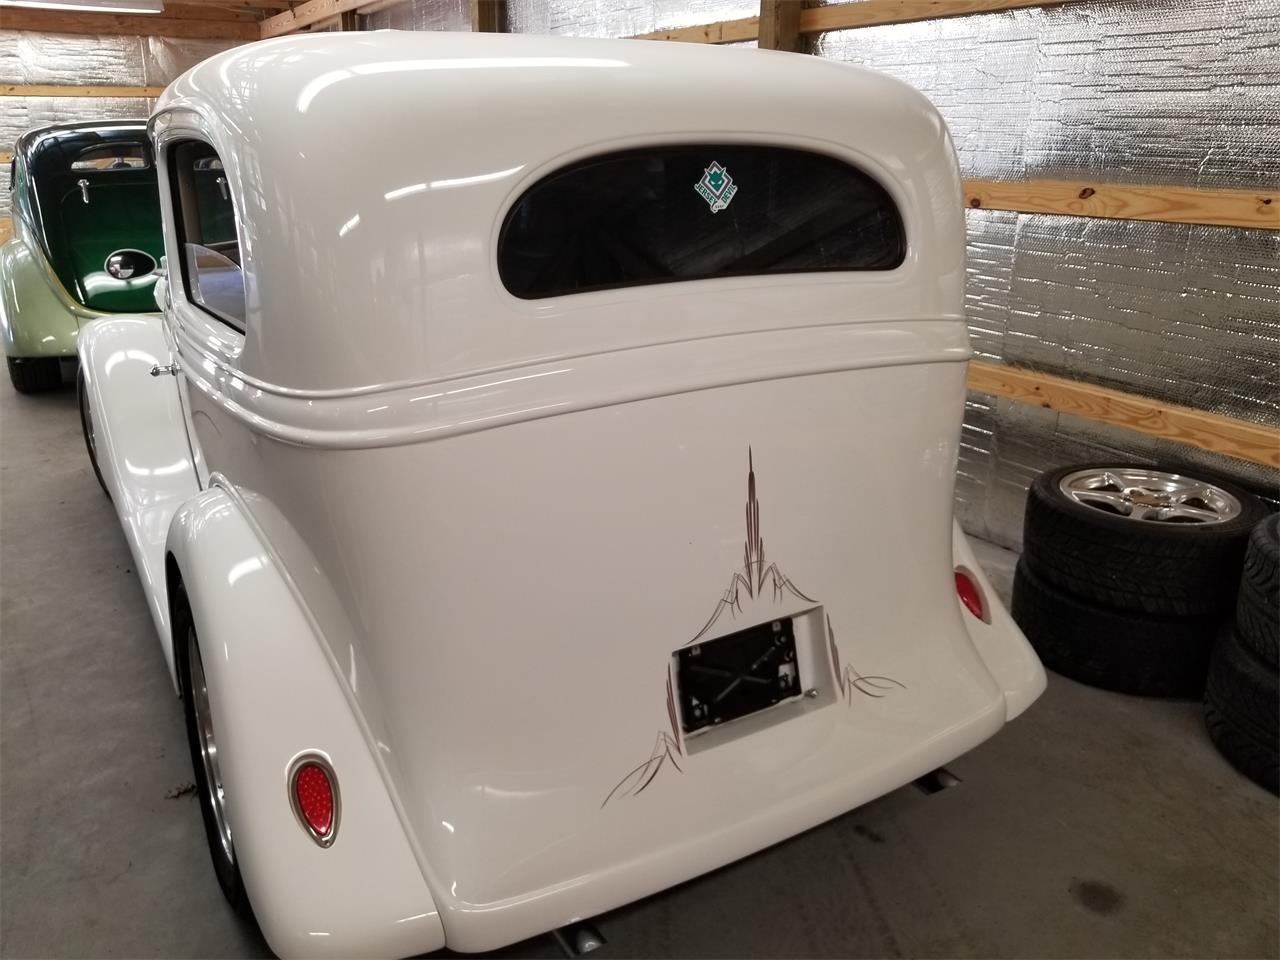 Large Picture of Classic 1935 Chevrolet Sedan located in Henderson North Carolina - $51,300.00 - QKKC